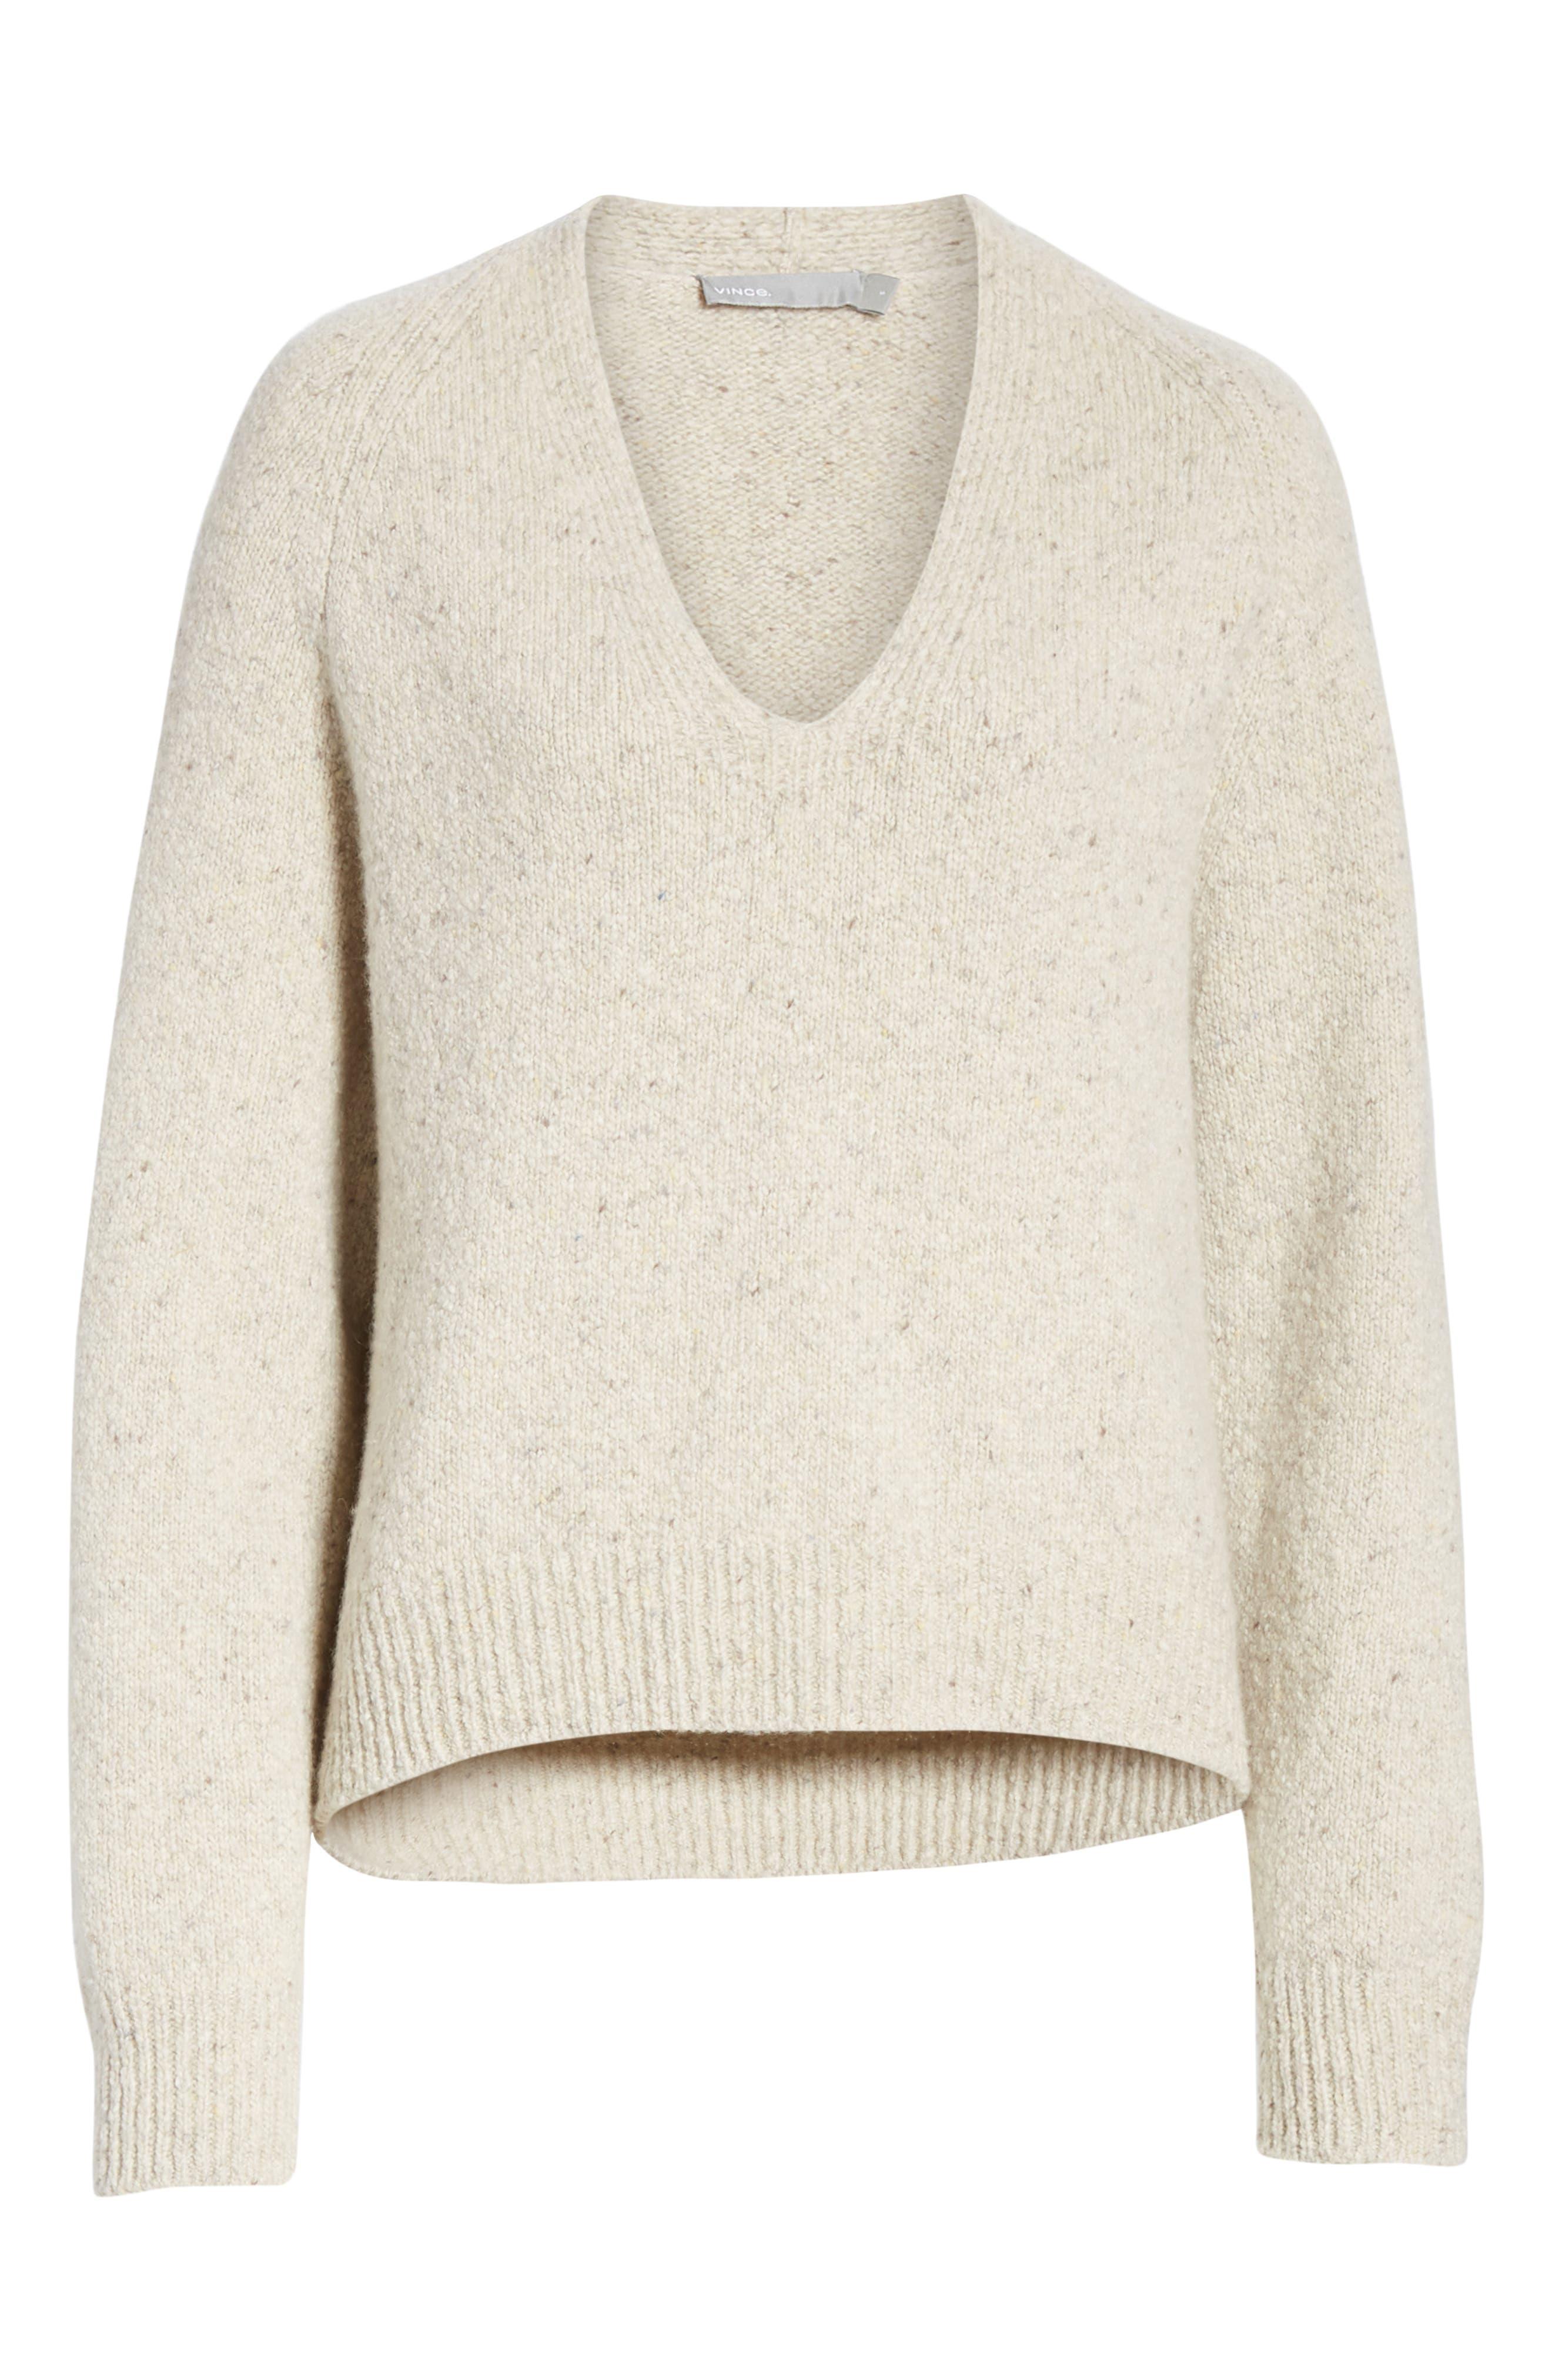 V-Neck Cashmere Sweater,                             Alternate thumbnail 6, color,                             902